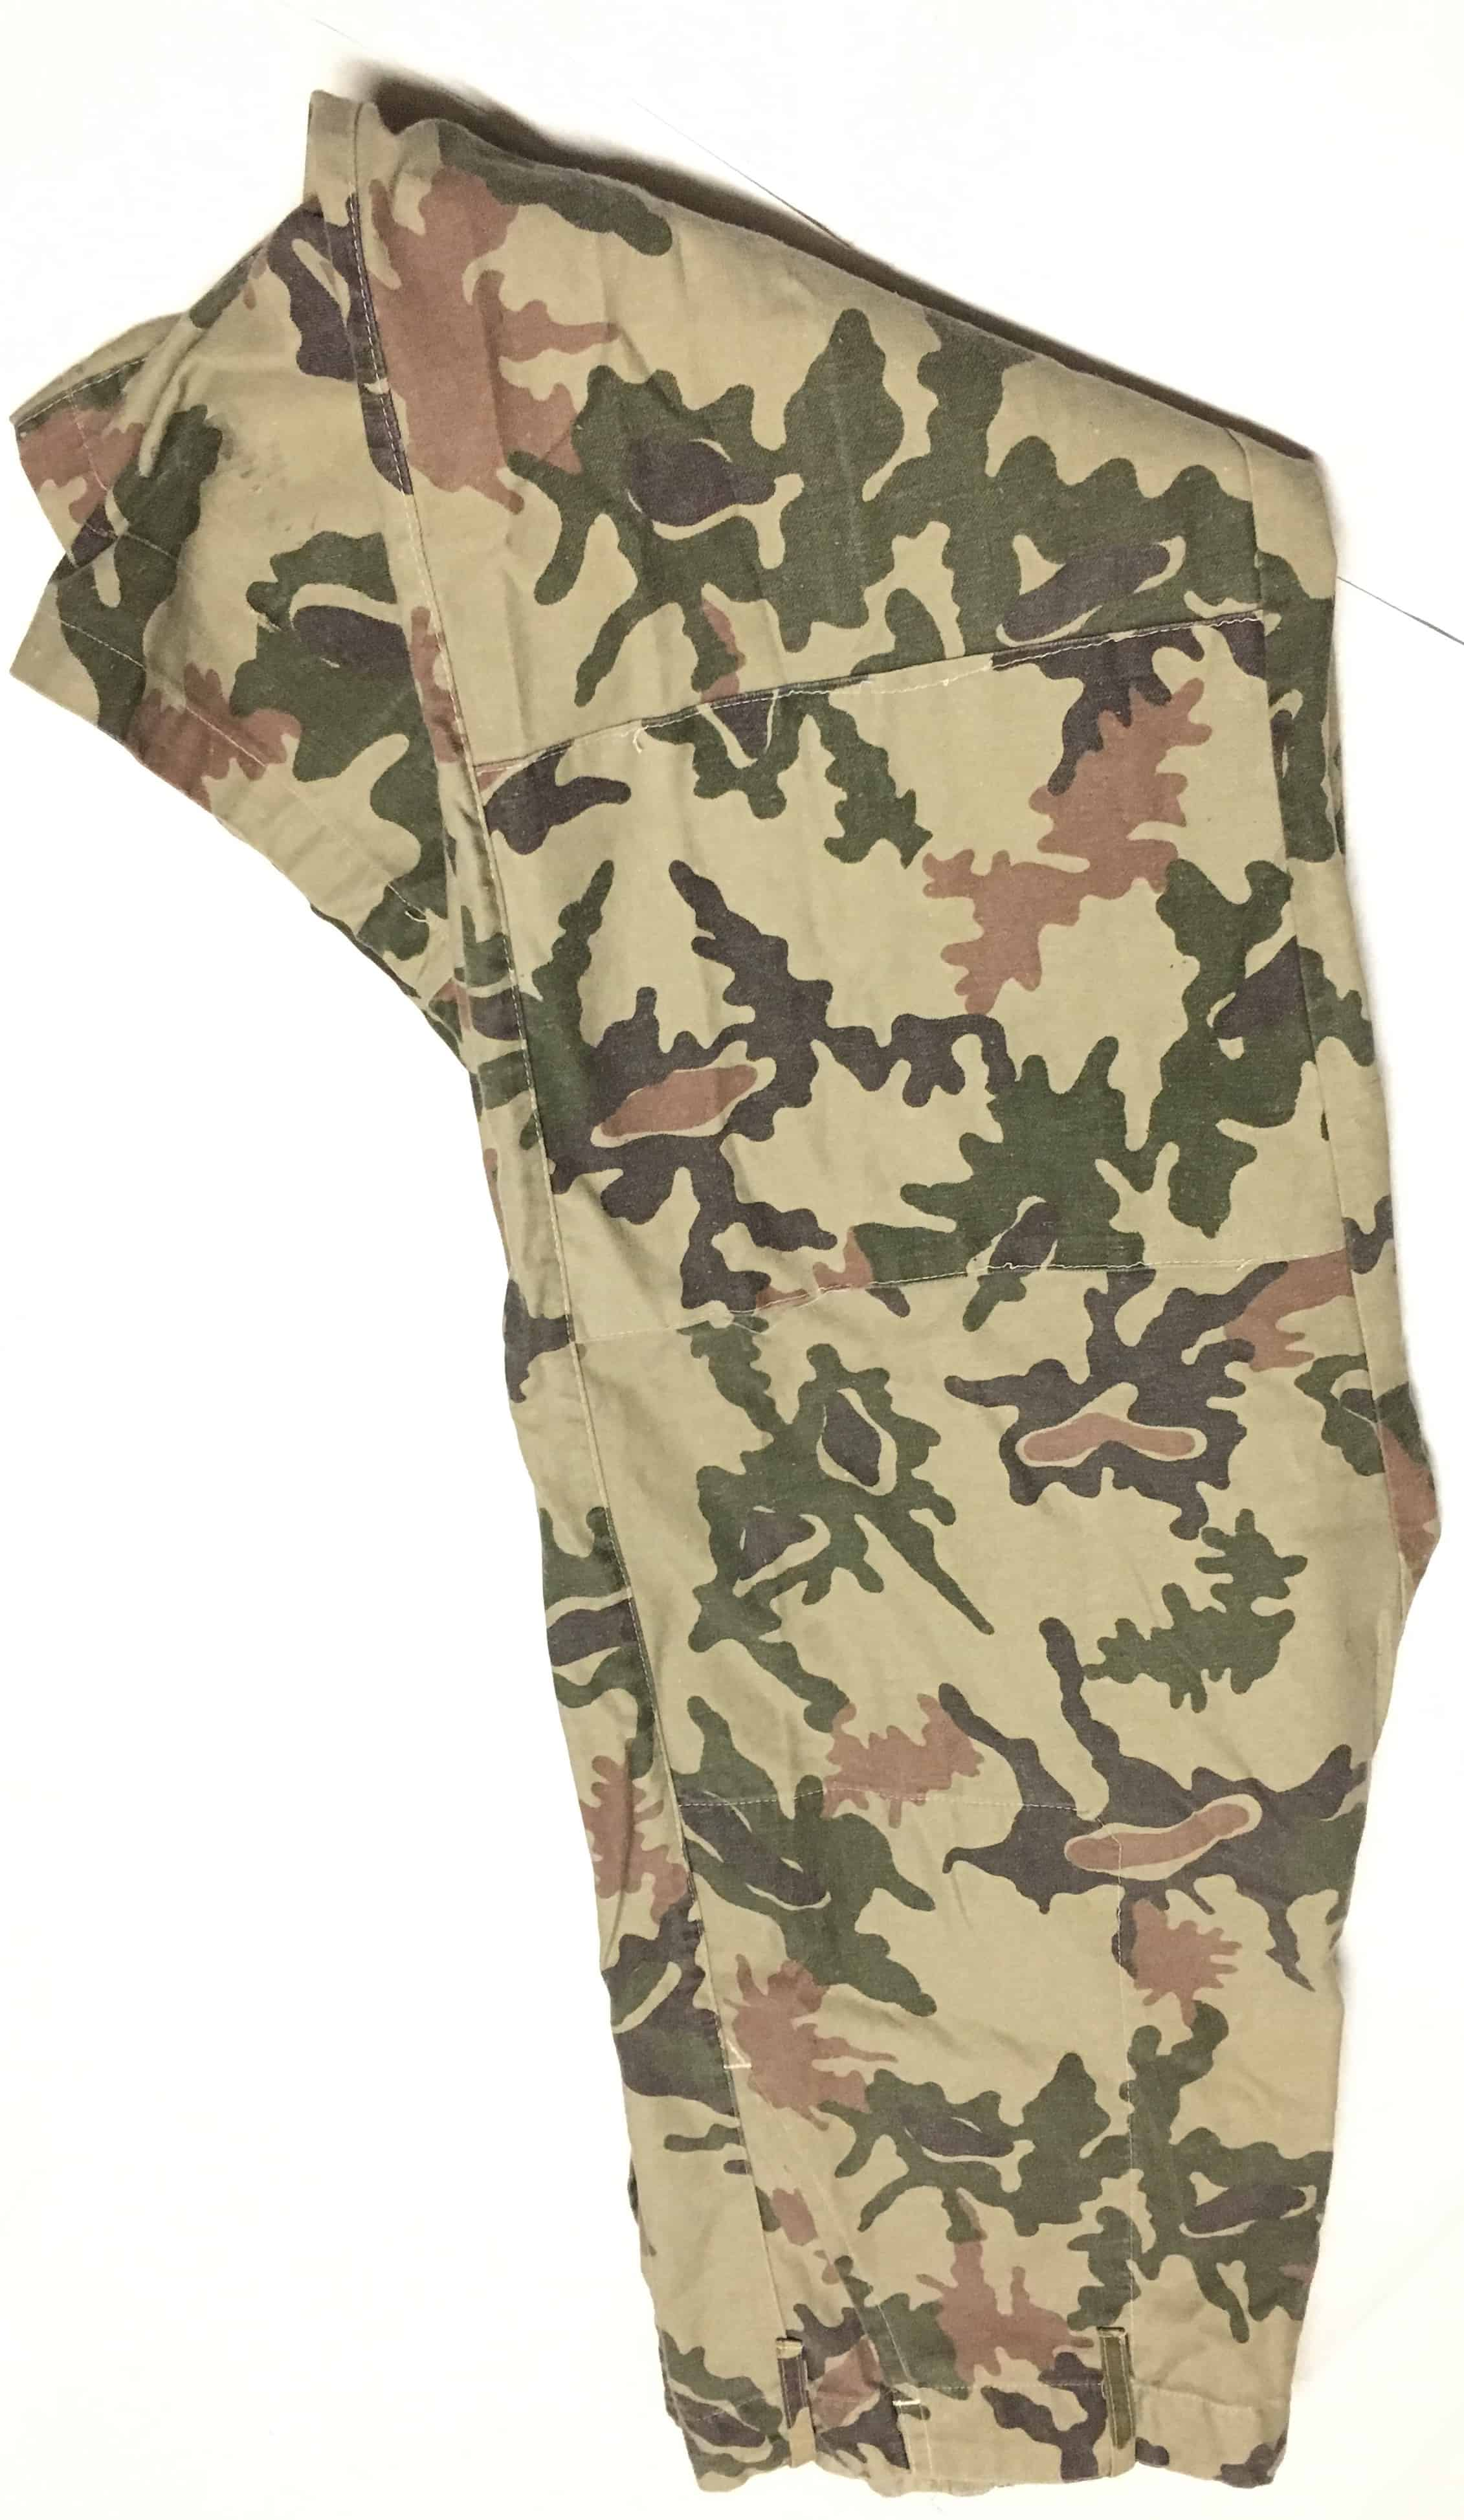 Iraqi Desert Camouflage Pants Unusual Pattern Similar To Egyptian